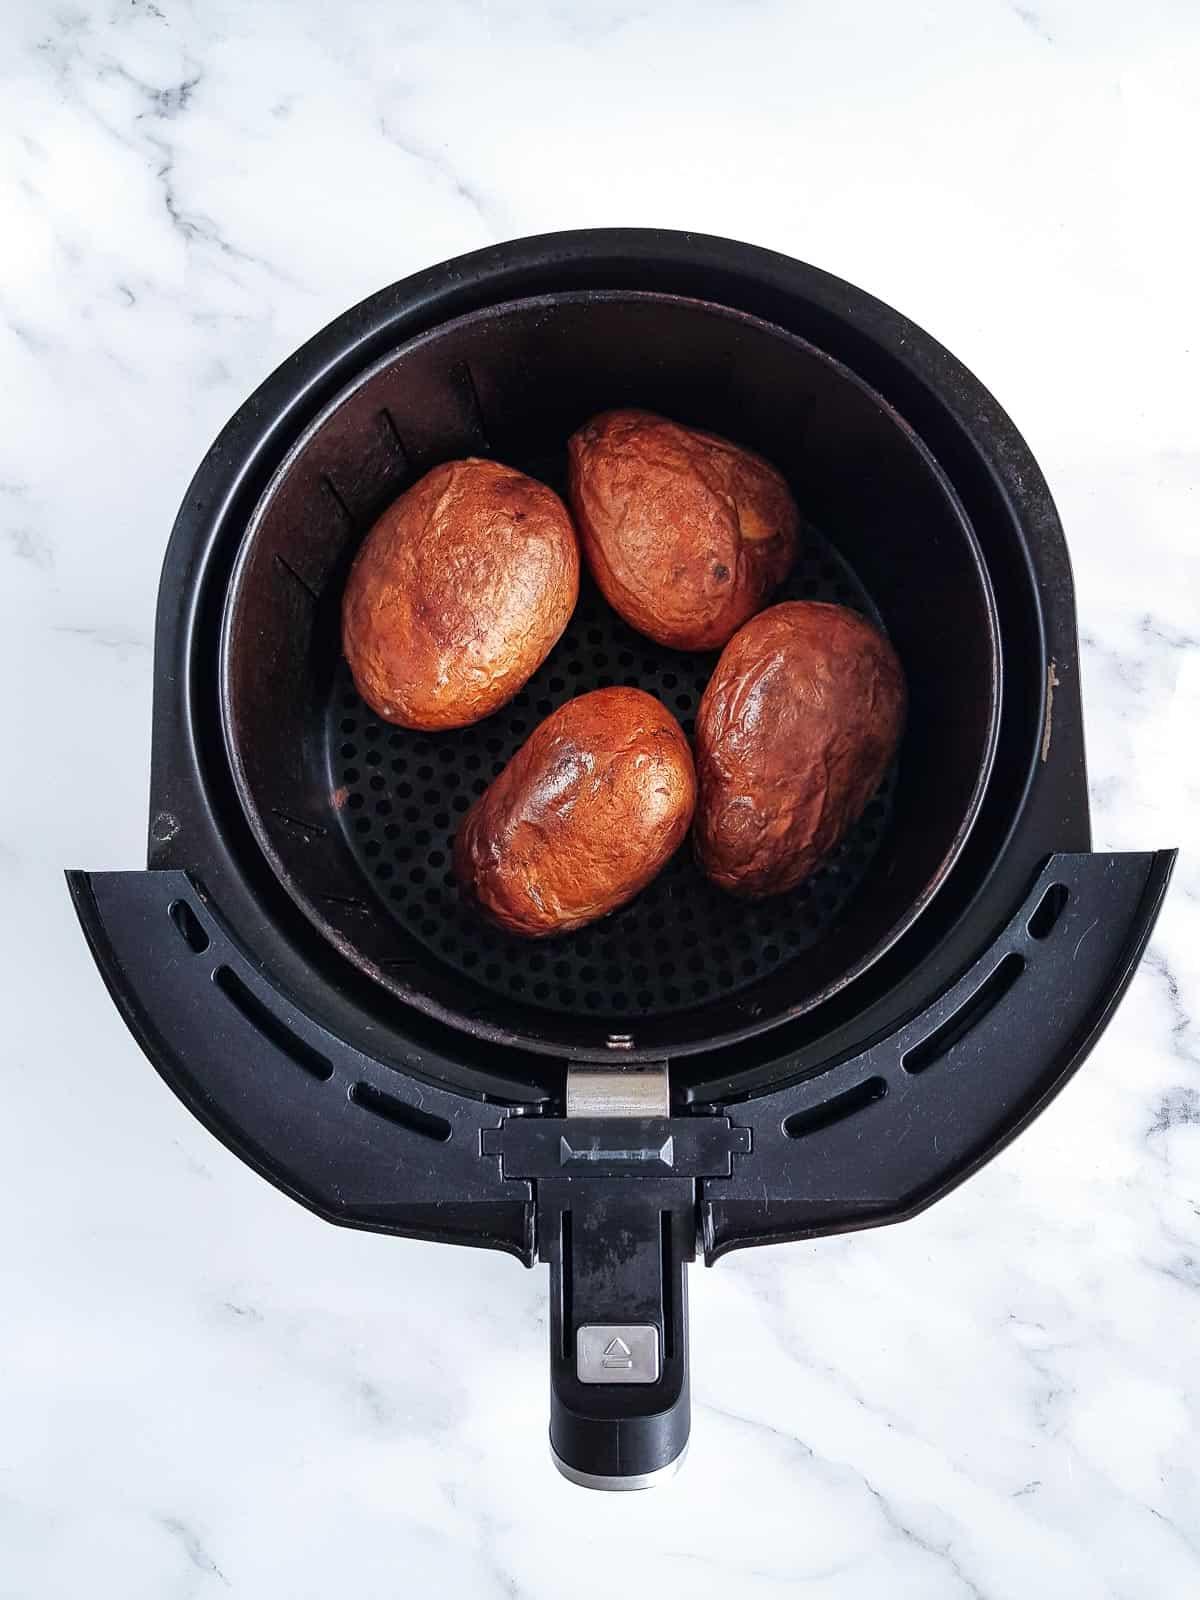 Baked potatoes in an air fryer.